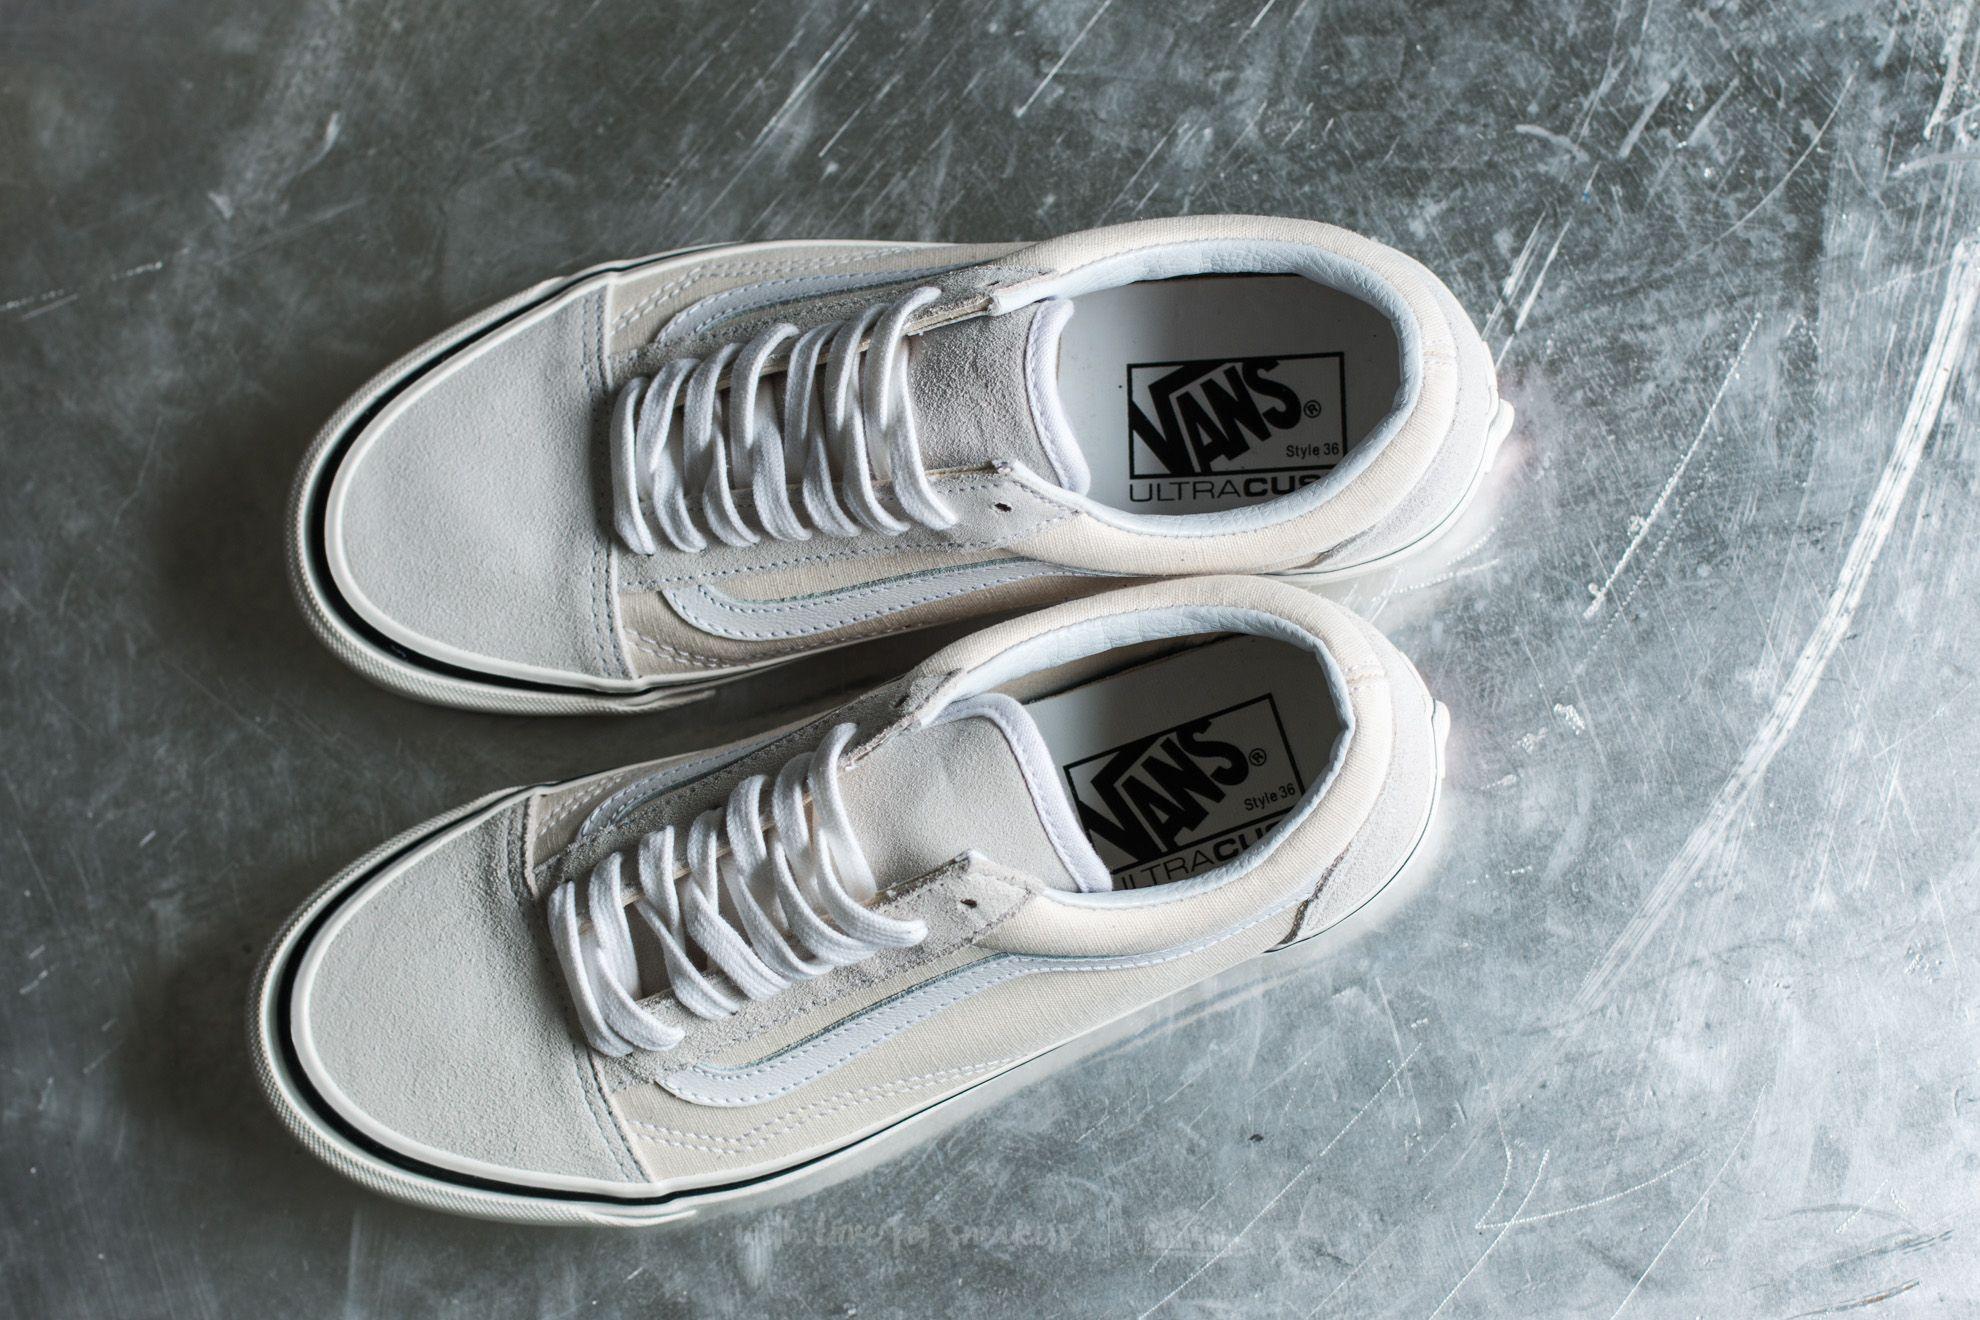 d32618dc285c56 Vans - Old Skool 36 Dx Anaheim Factory Classic White for Men - Lyst. View  fullscreen